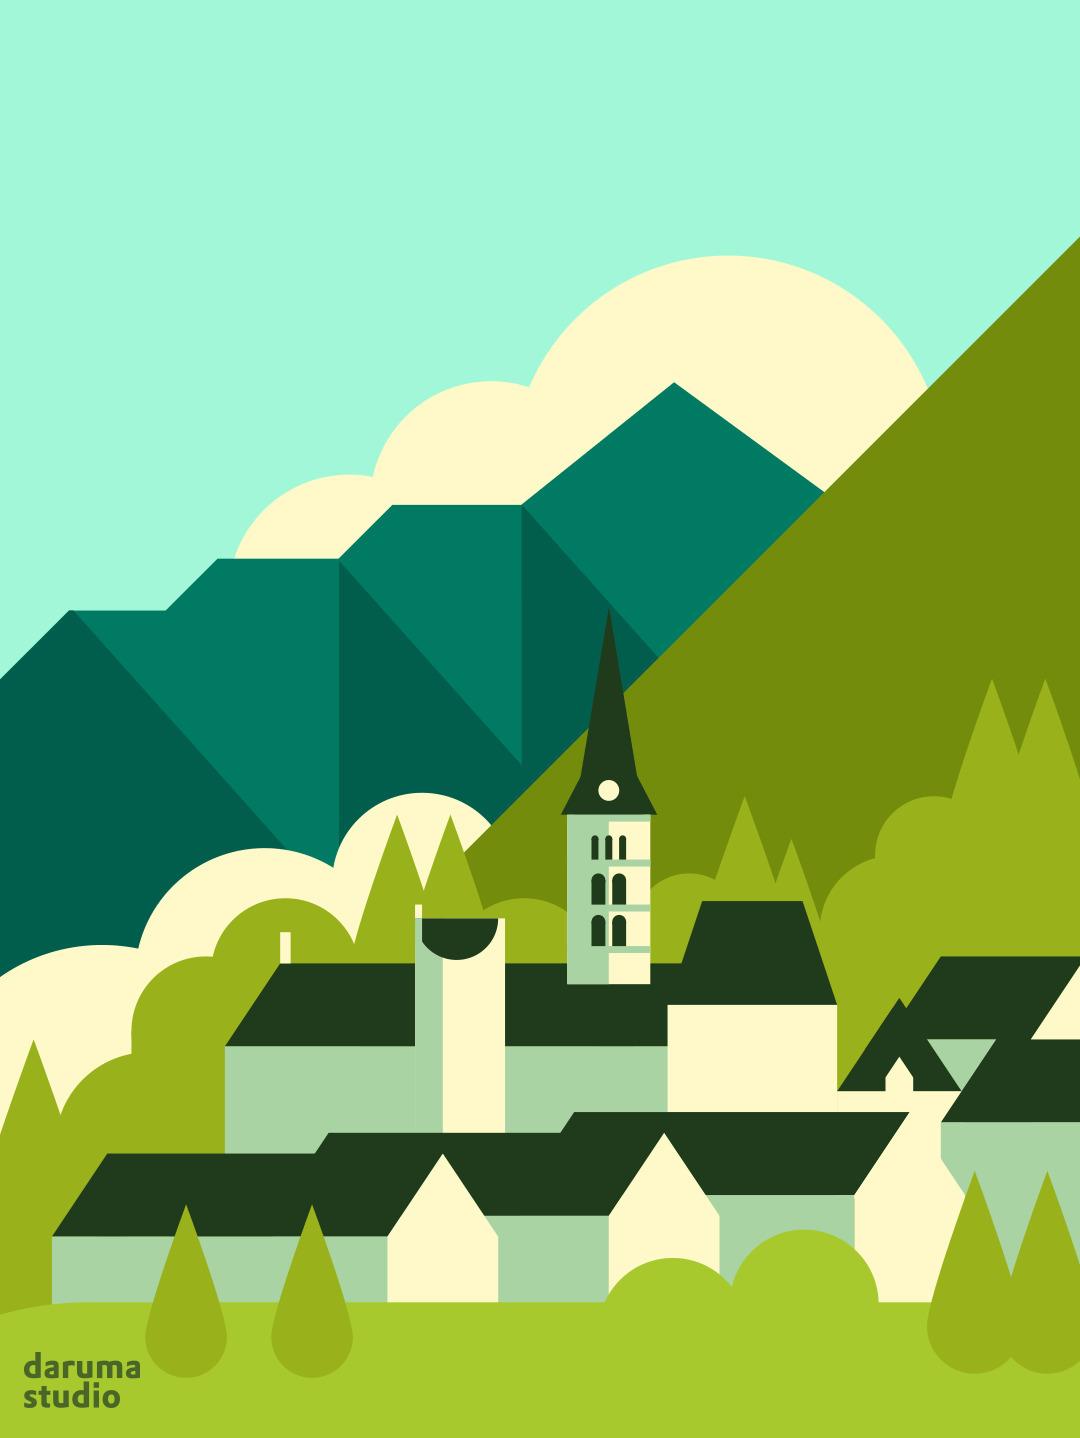 Vall (Aran Valley - graphics, design - daruma_studio | ello